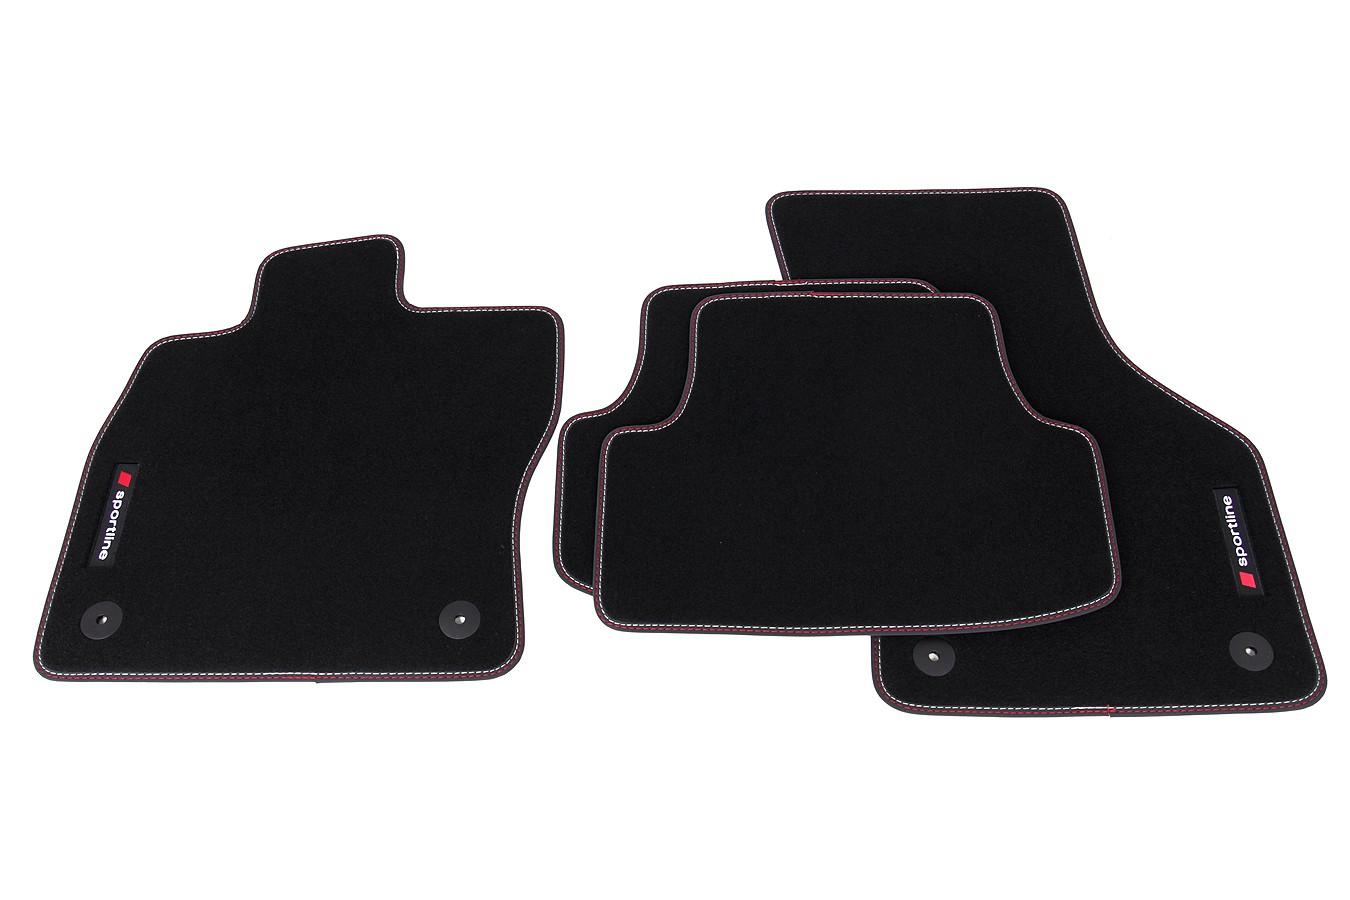 premium sportline fu matten f r seat leon 3 iii 5f ab bj. Black Bedroom Furniture Sets. Home Design Ideas